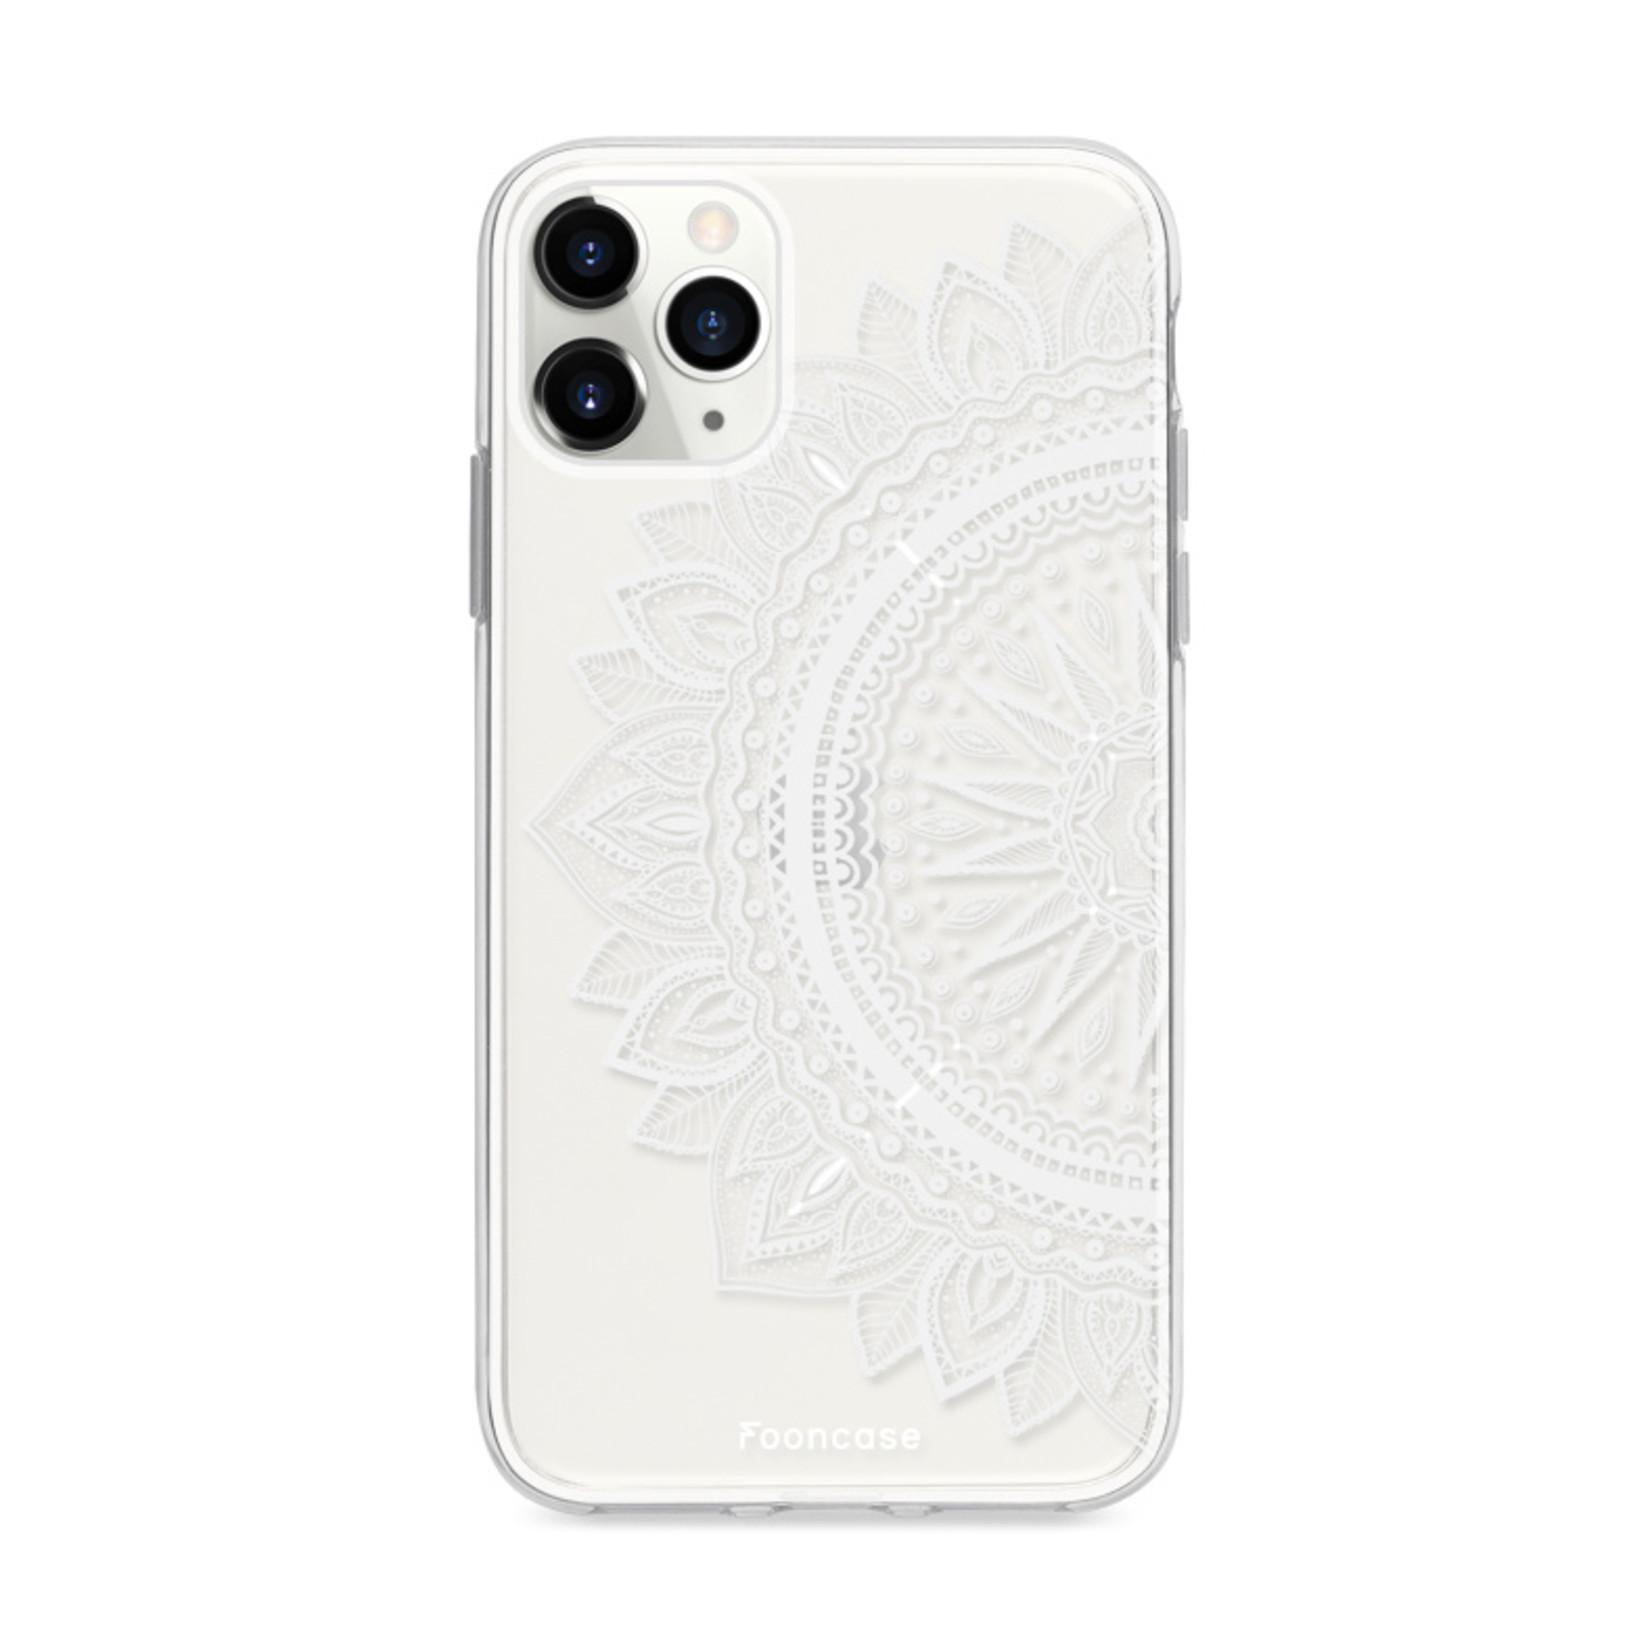 FOONCASE IPhone 11 Pro Handyhülle - Mandala